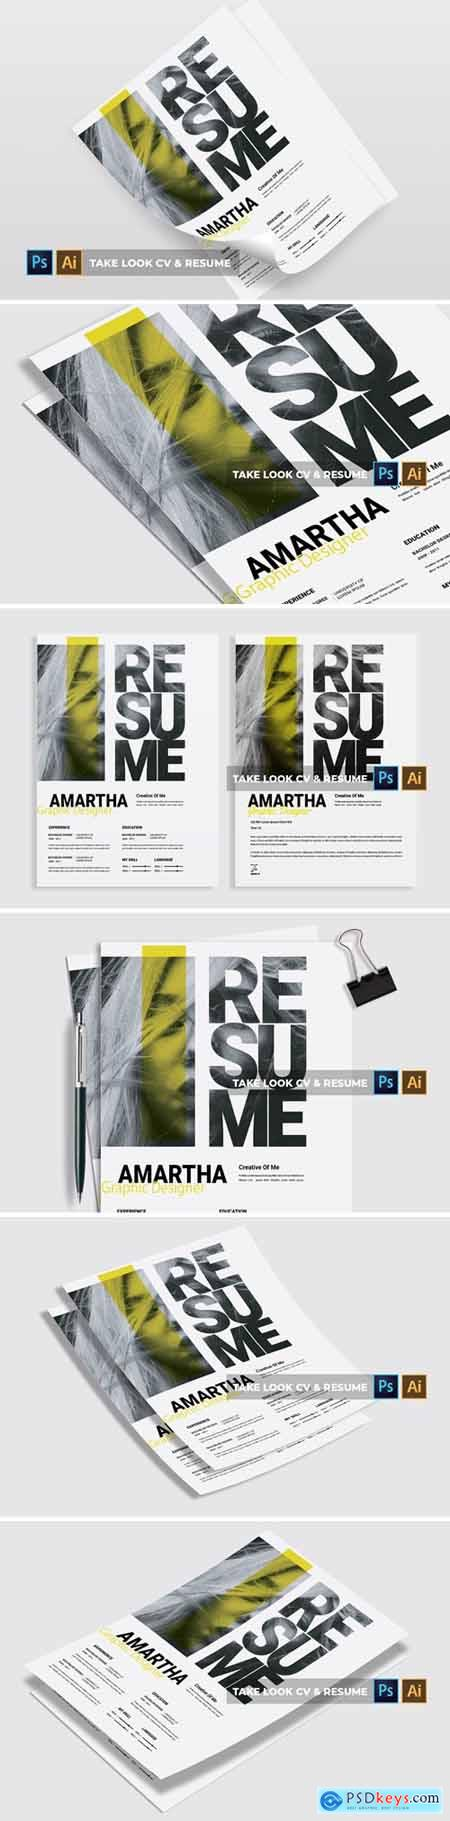 Take Look - CV & Resume